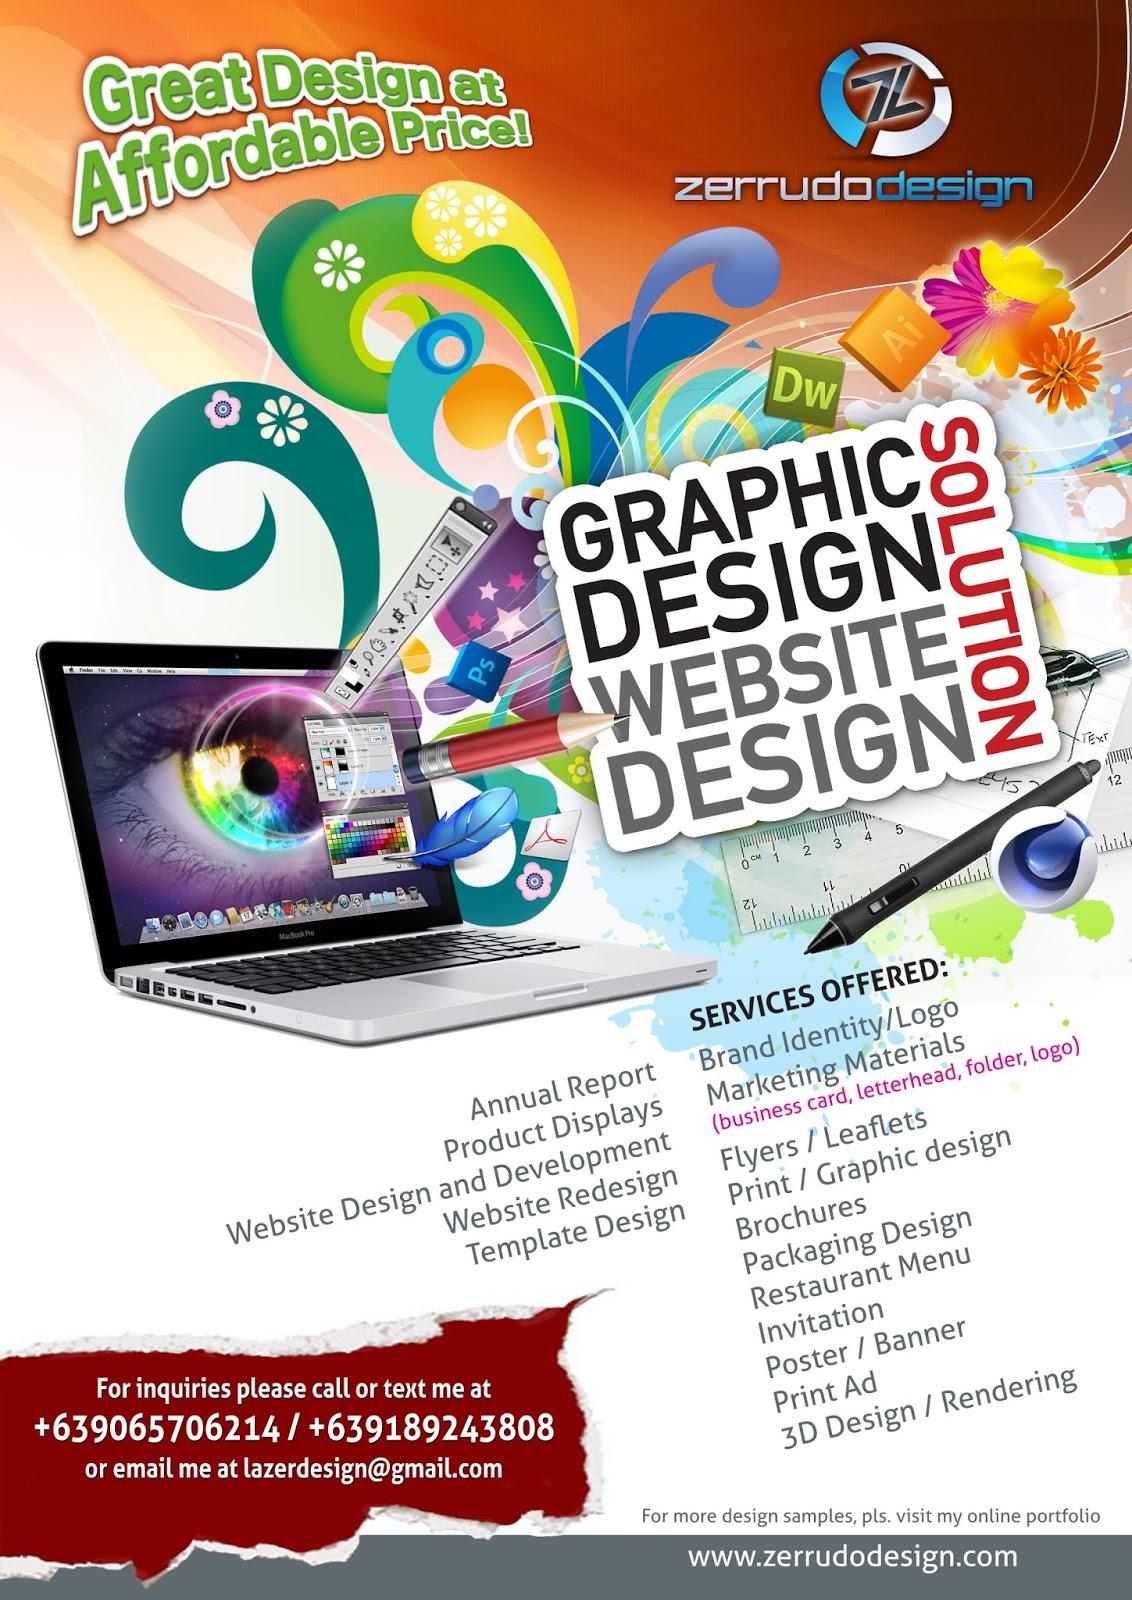 Promo flyer design akbaeenw promo flyer design business cards reheart Gallery